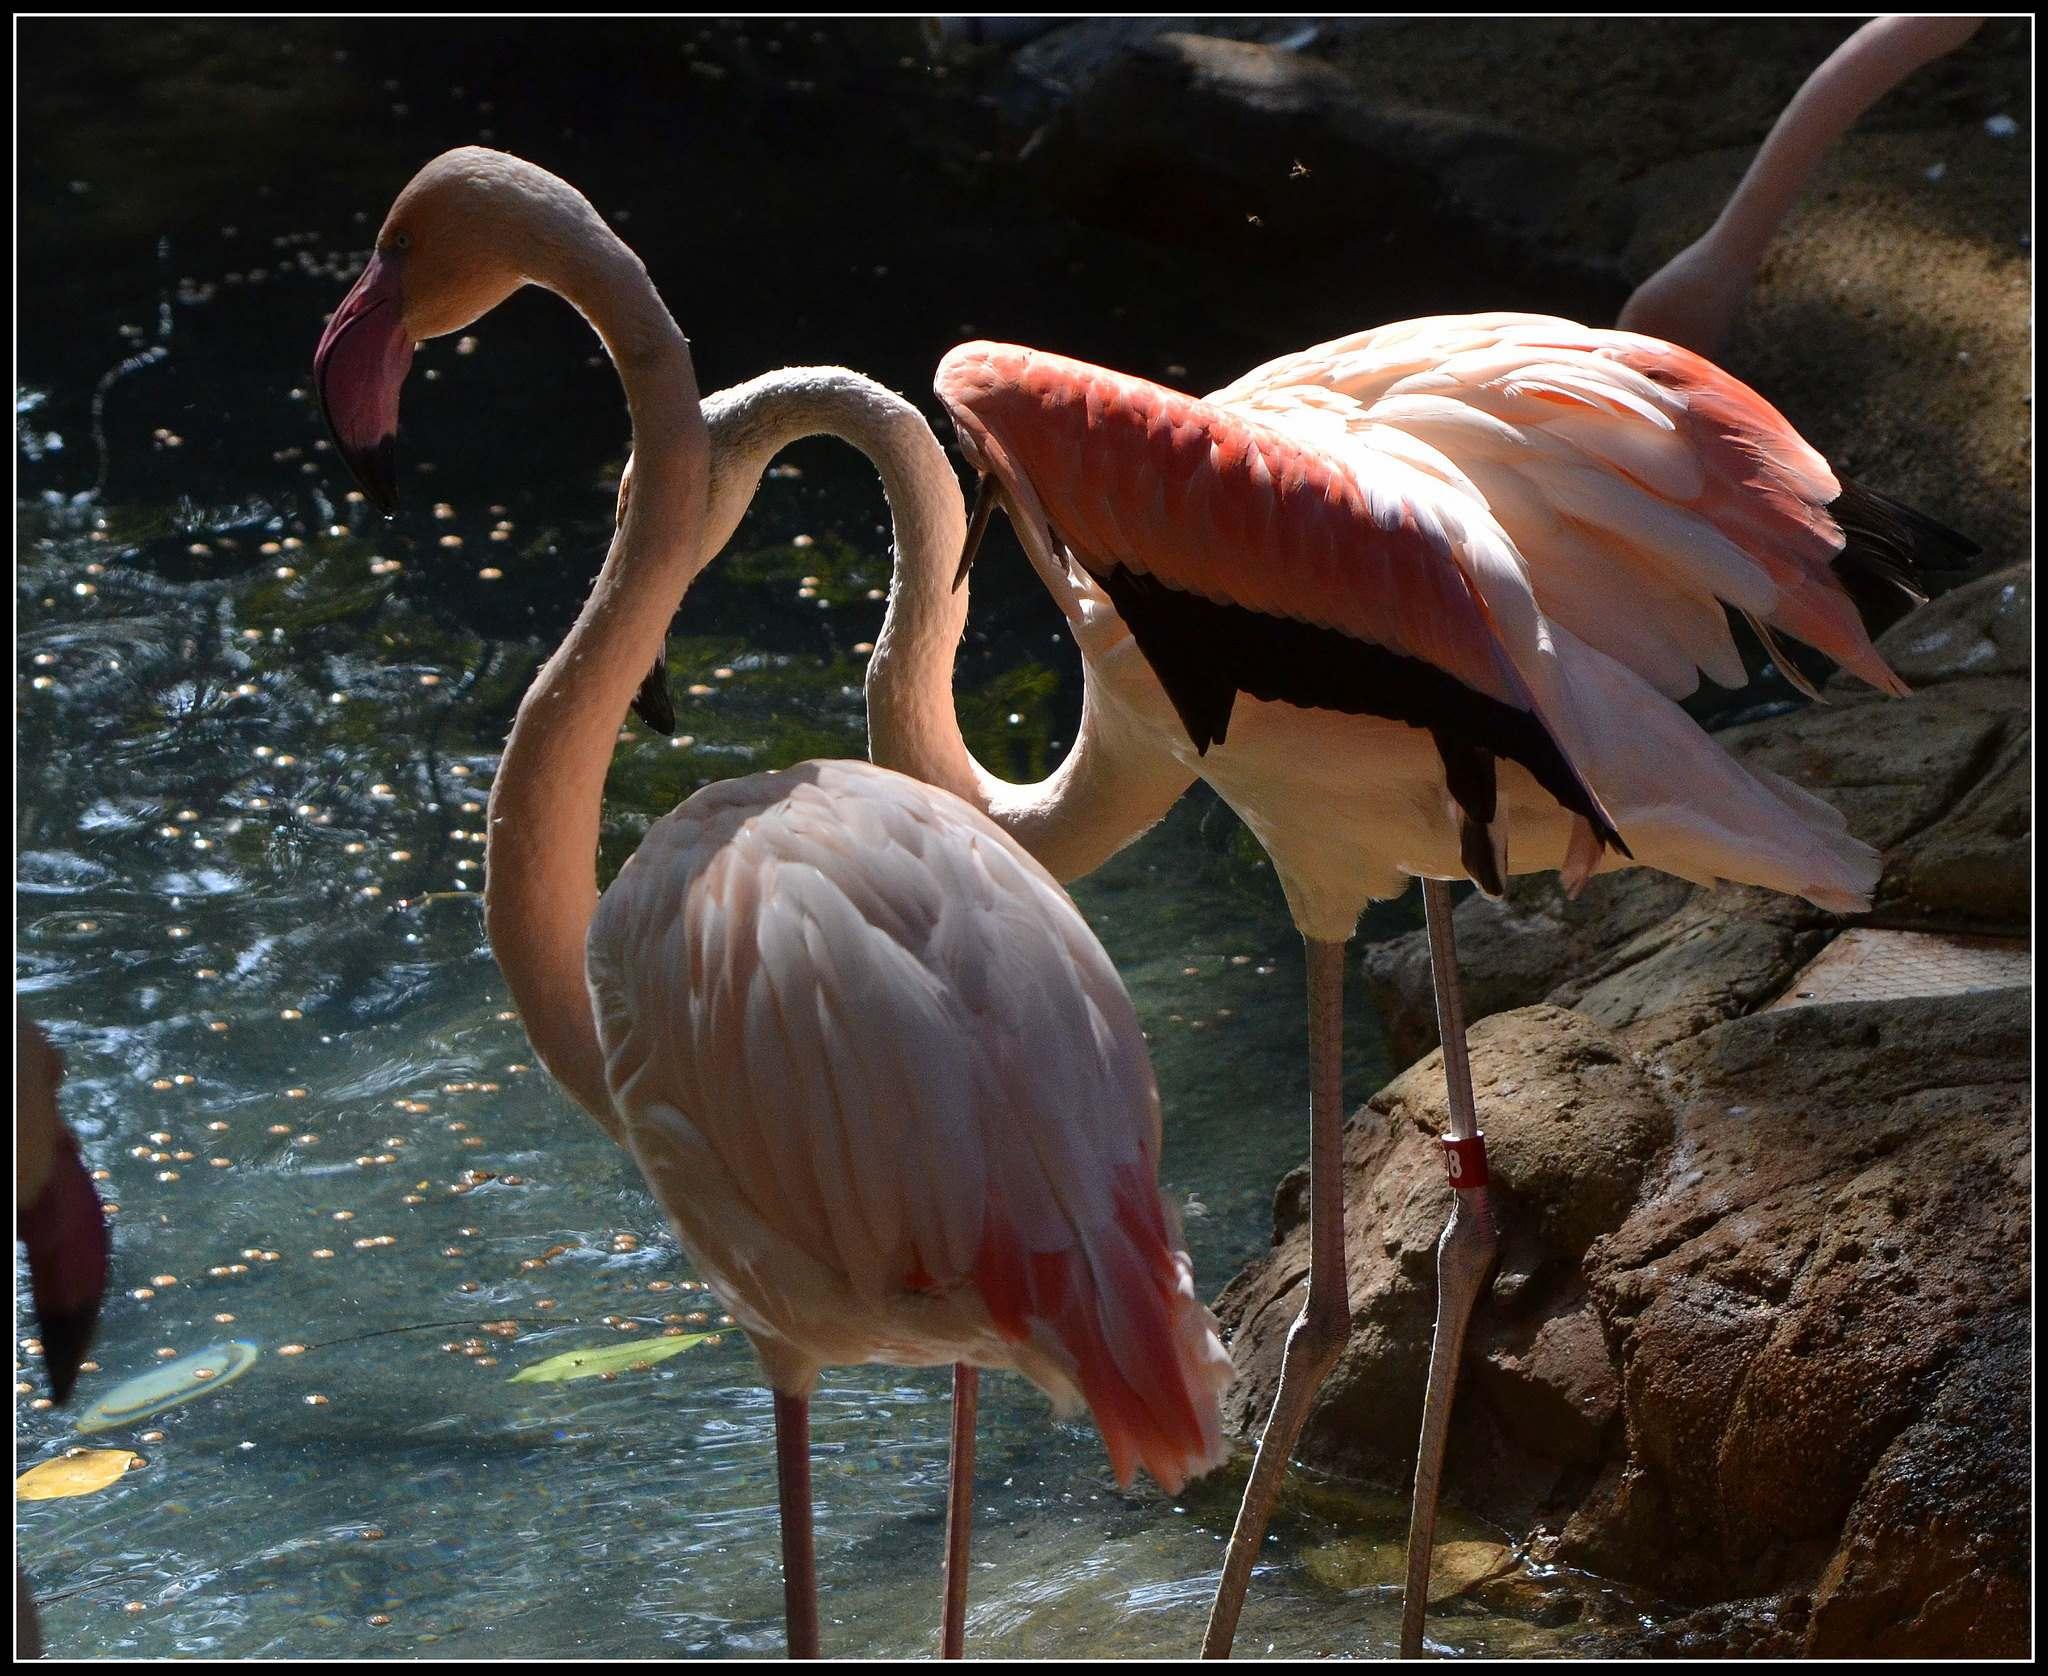 los angeles zoo12 Los Angeles Zoo Facts